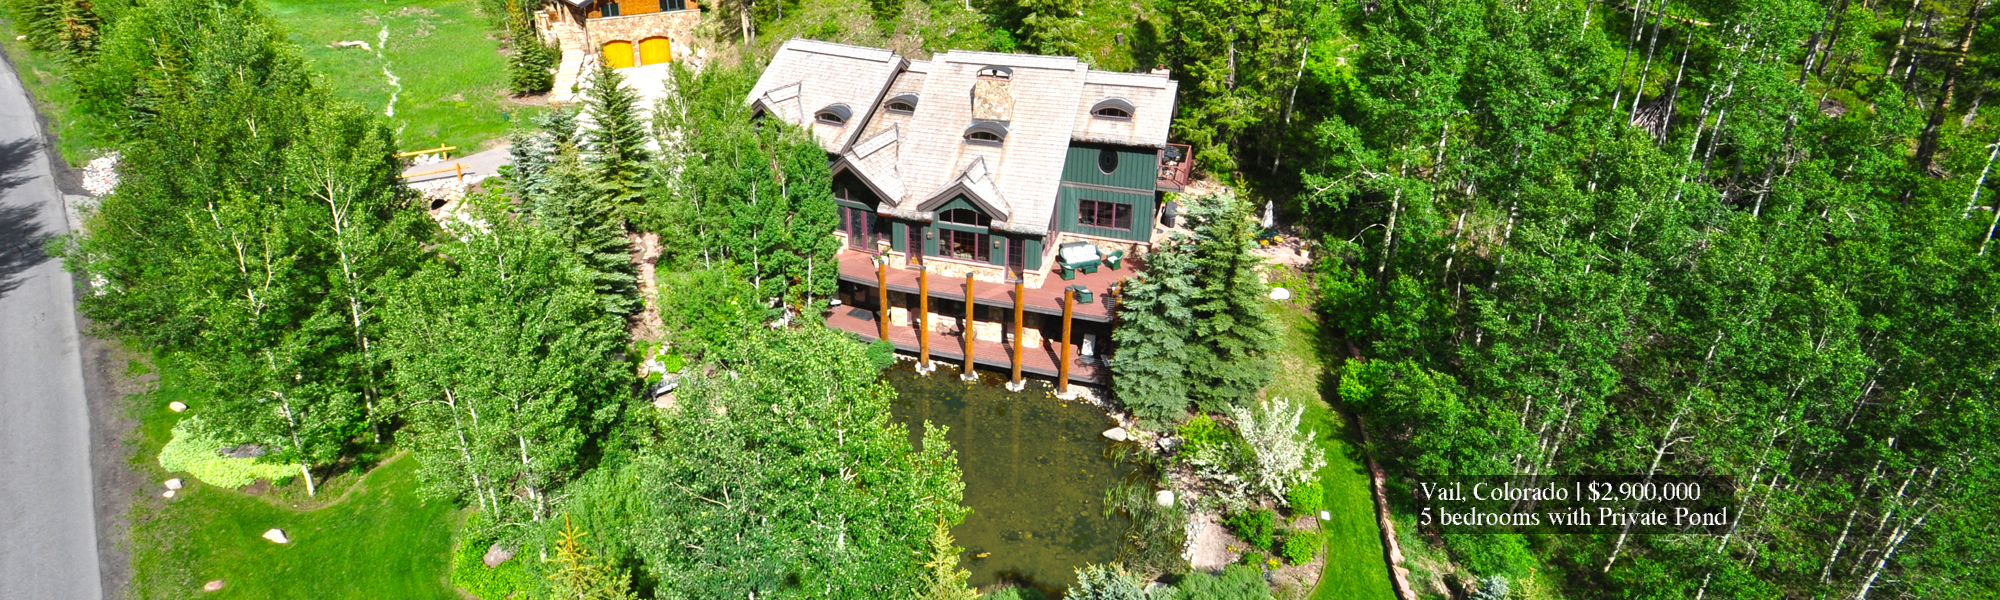 1730 Buffehr Creek Rd Vail, Colorado